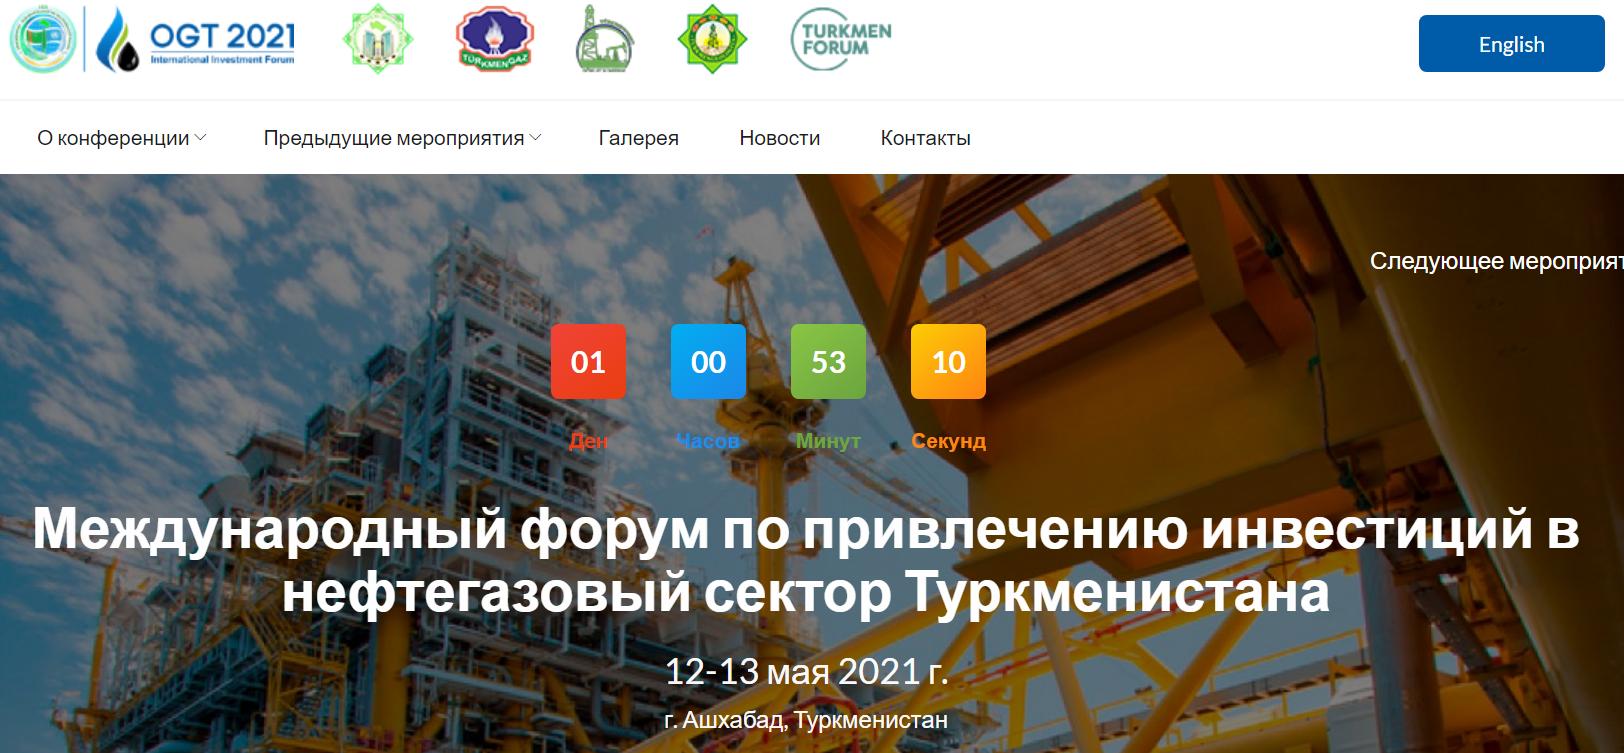 https://www.oilgas.gov.tm/storage/posts/2168/original-1609a366c70eda.png